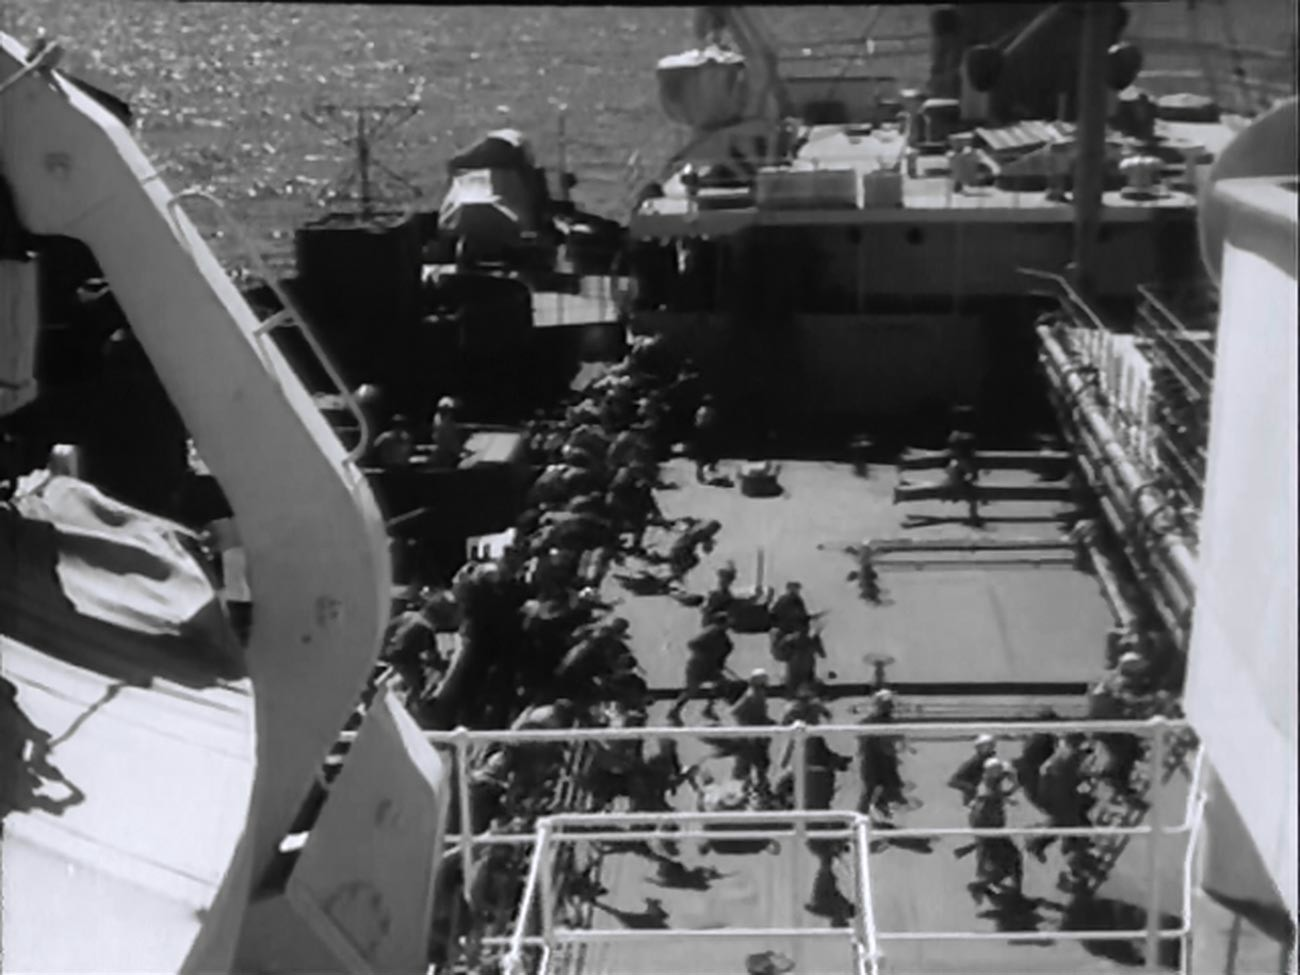 Foto adegan dari film Soviet 'CH. P. Chrezvychaynoye proisshestviye' ('Keadaan Darurat), yang diangkat dari kisah nyata penangkapan kapal tanker Soviet 'Tuapse'.